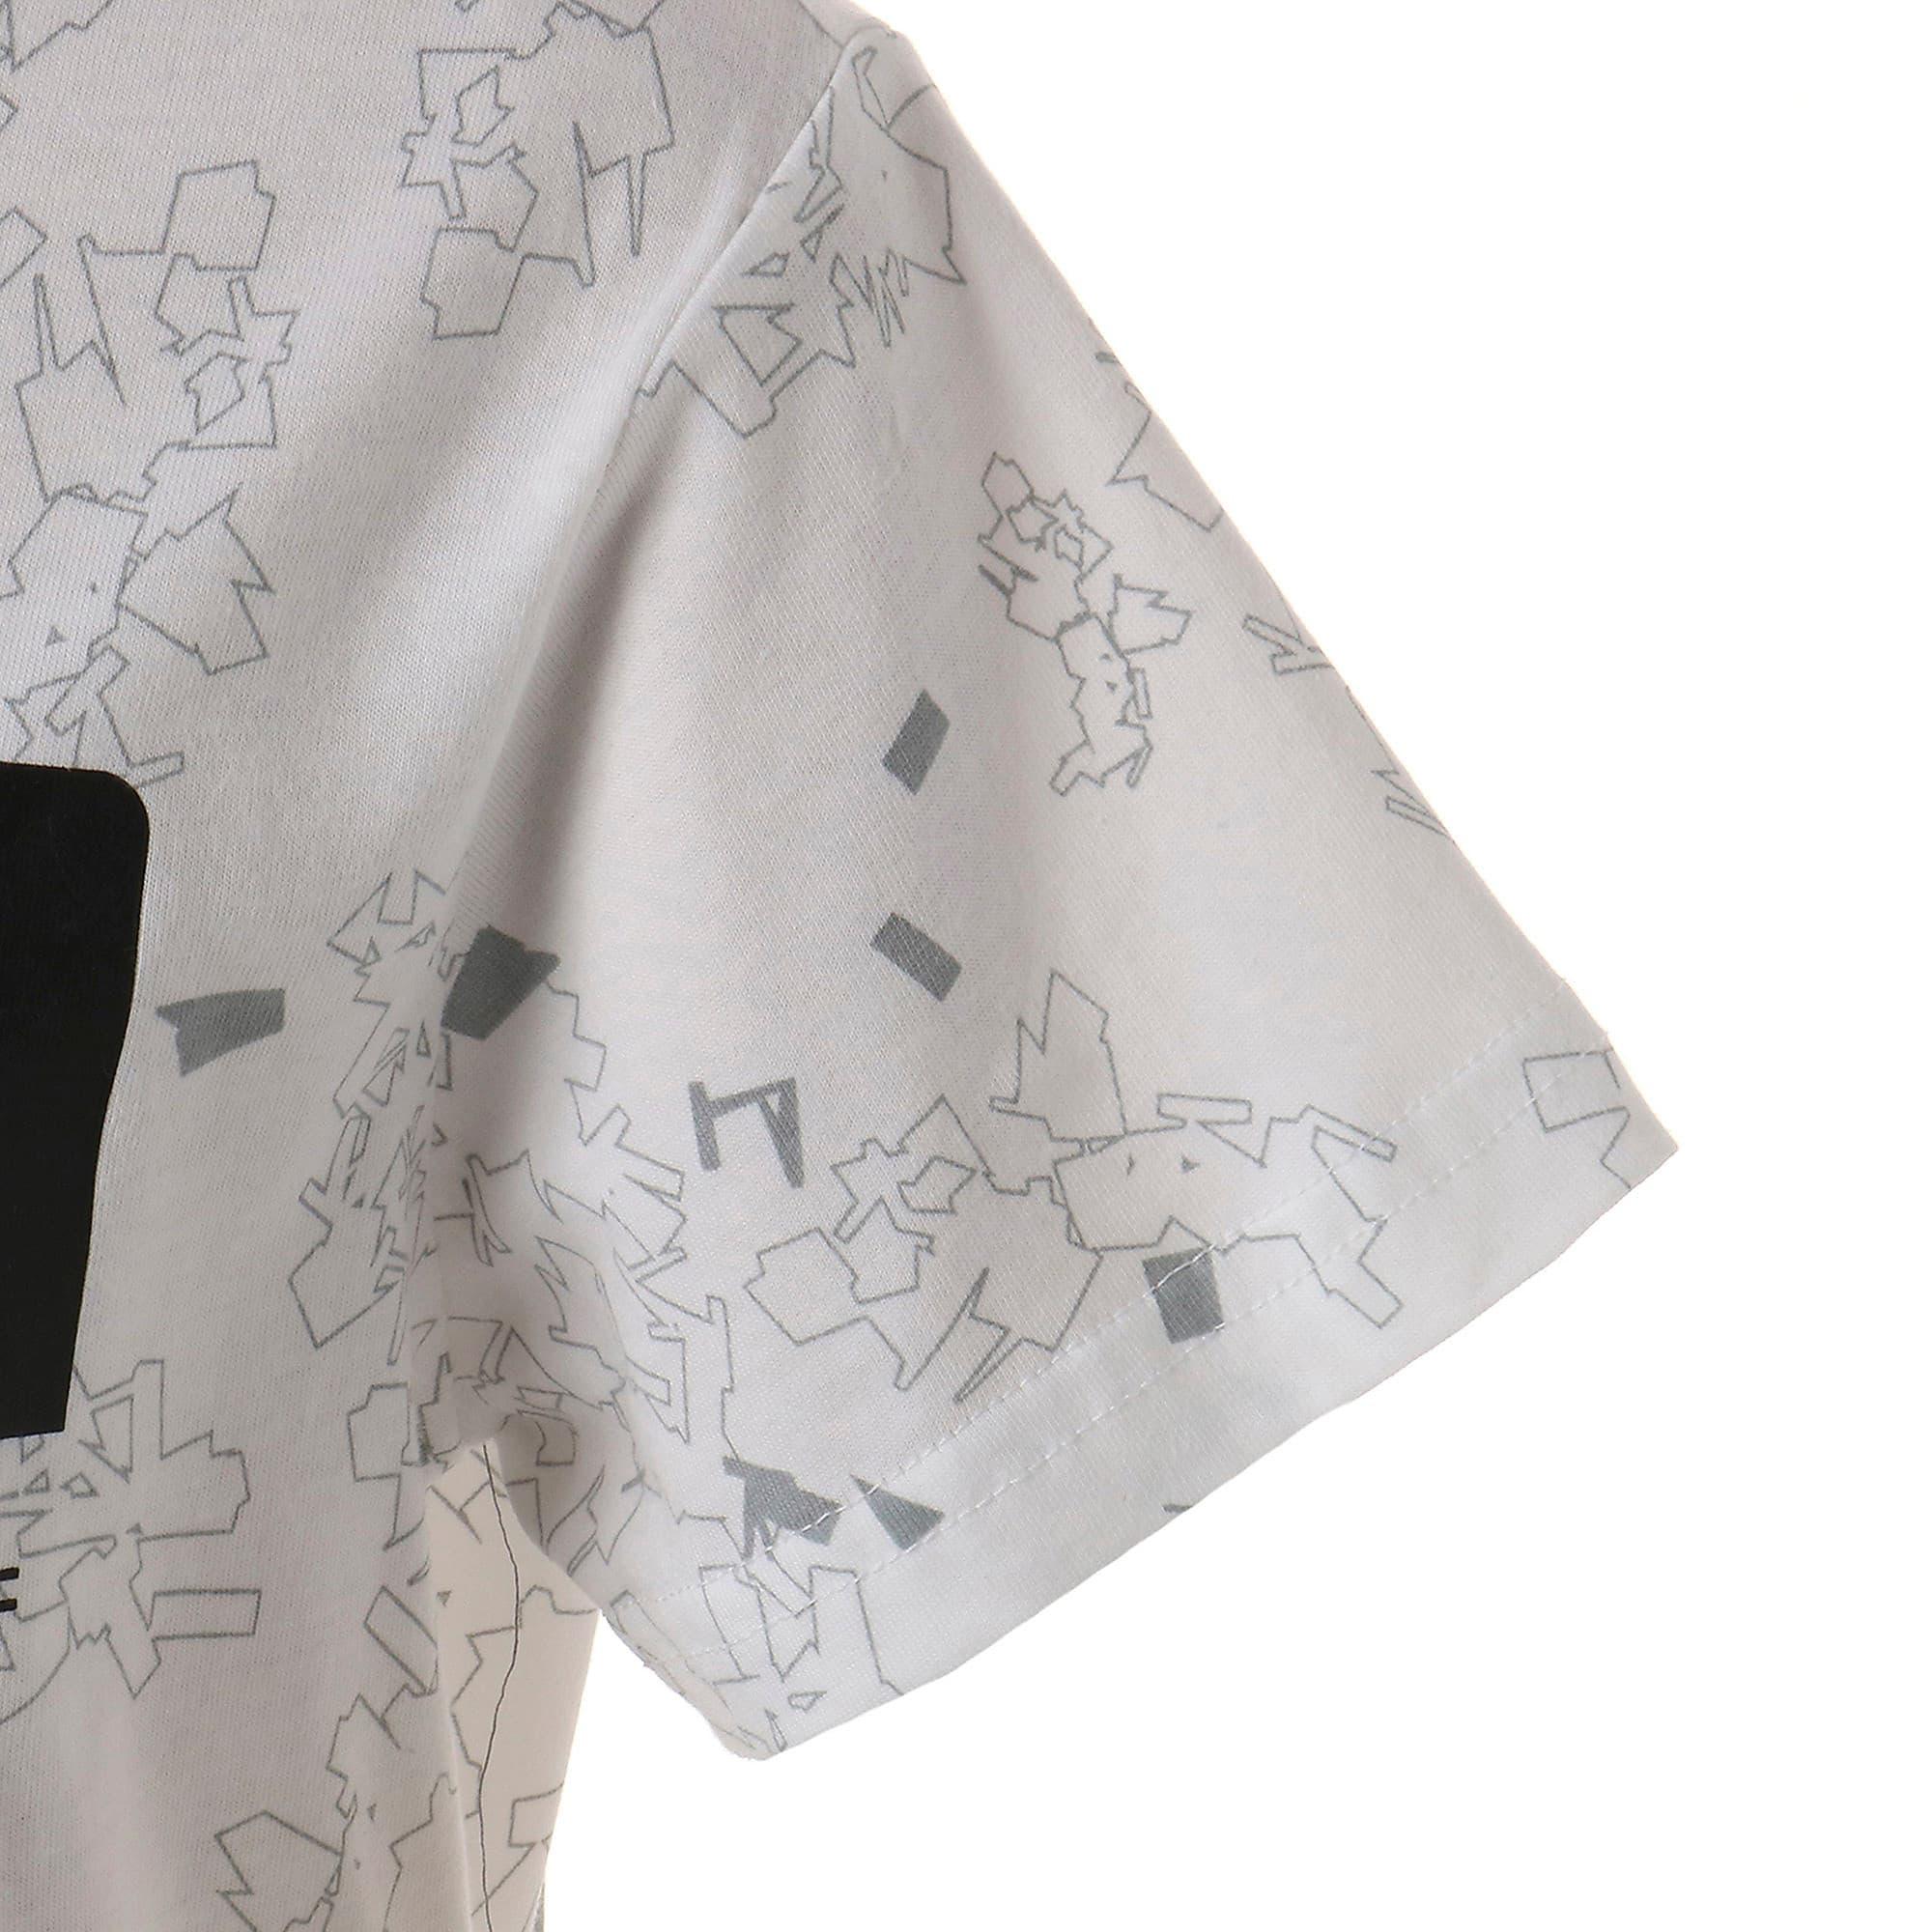 Thumbnail 5 of キッズ ACTIVE SS AOP Tシャツ 半袖, Puma White, medium-JPN